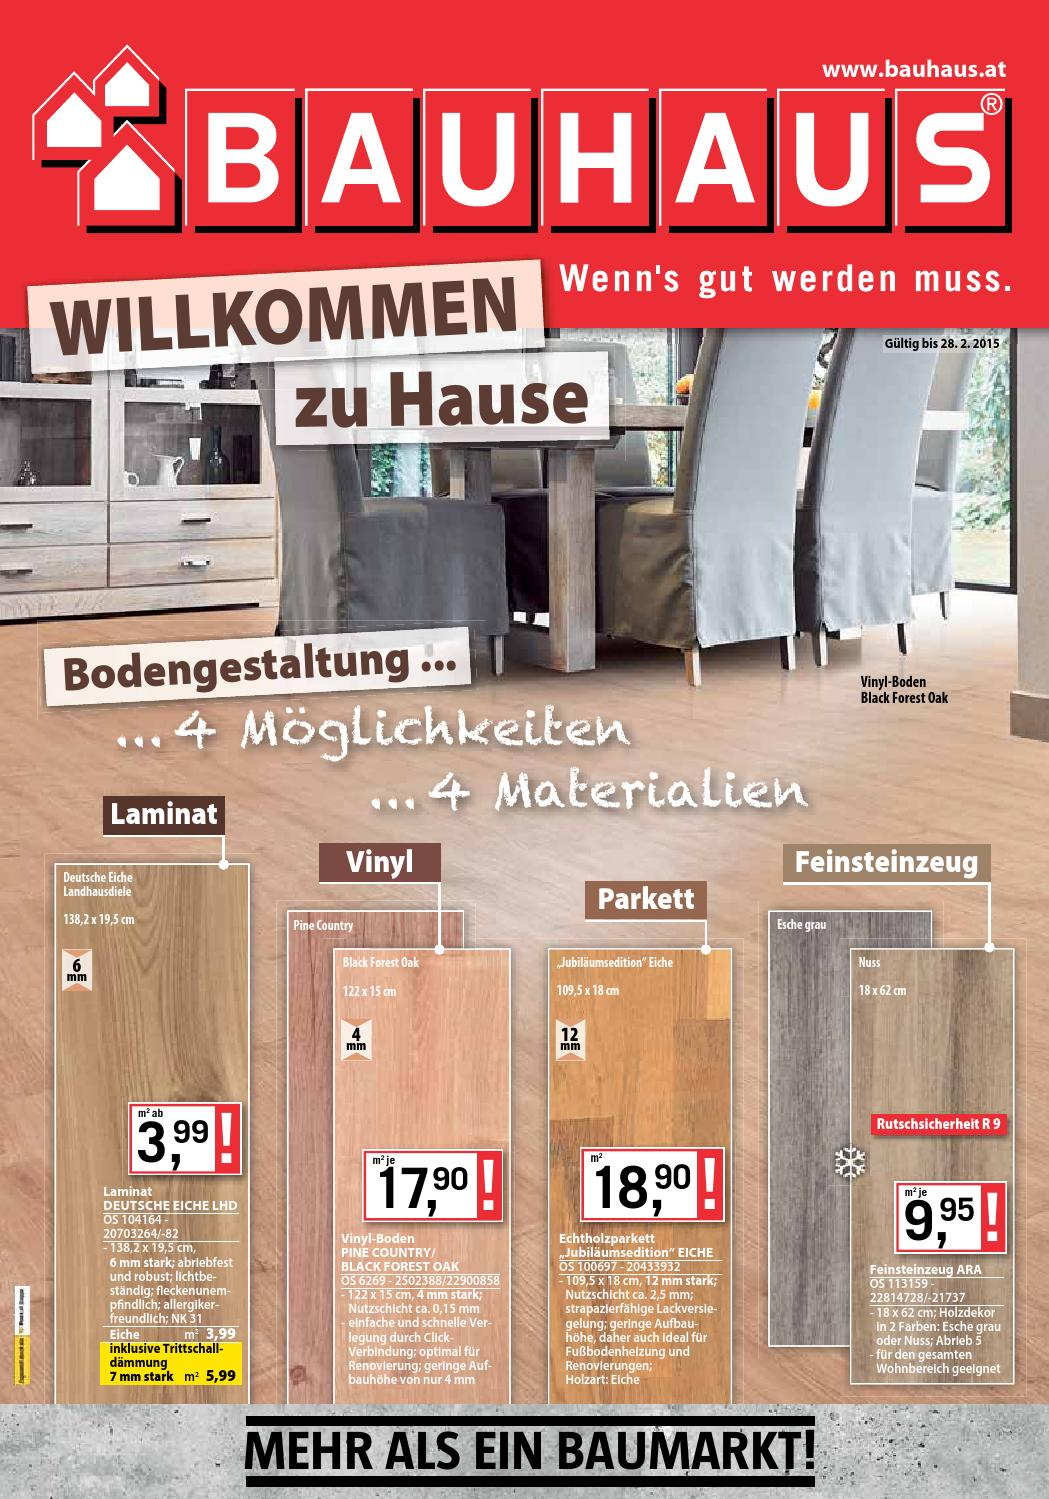 Bauhaus Angebote 3 28feber2015 By Promoangebote At Issuu